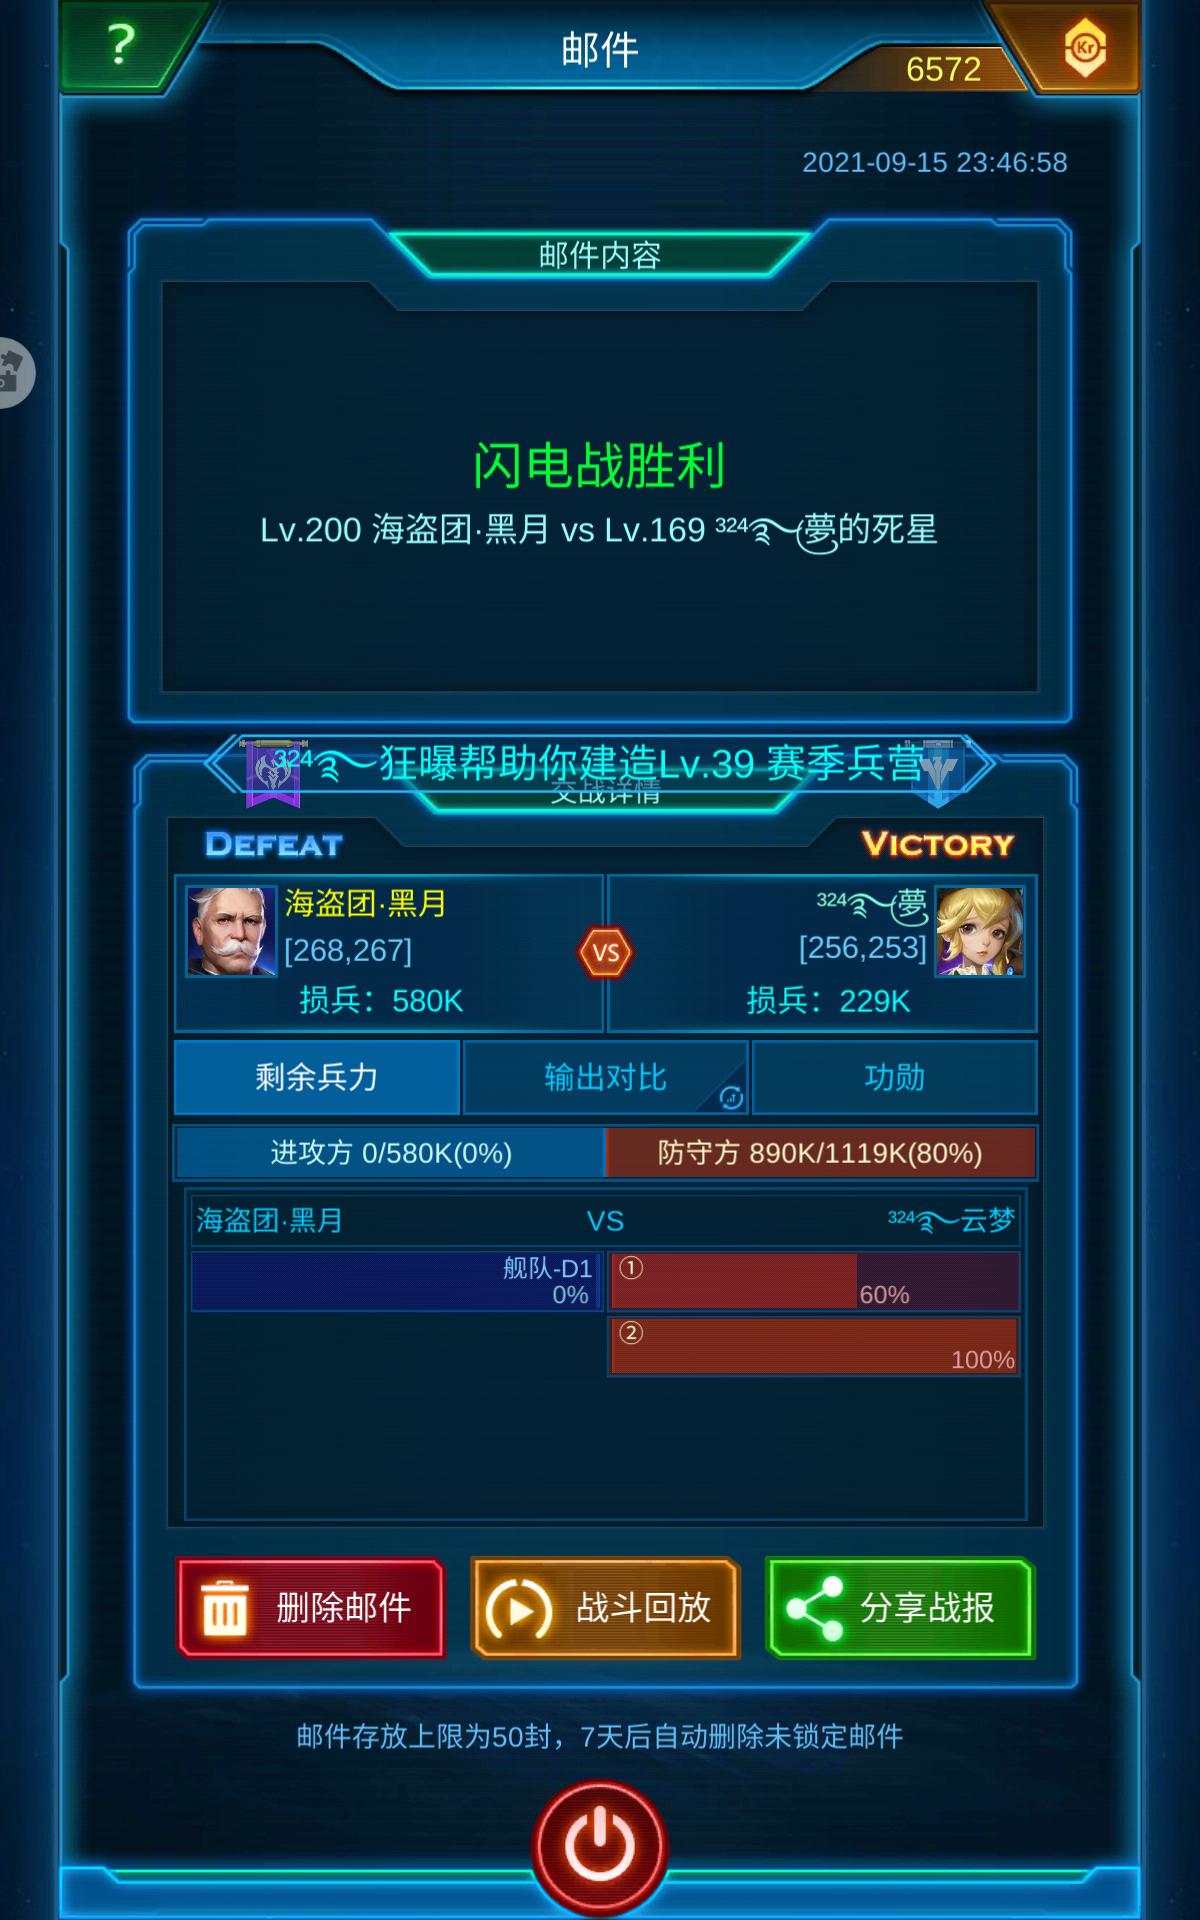 Screenshot_2021-09-15-23-47-28-670_com.jedigames.p16s.huawei.png